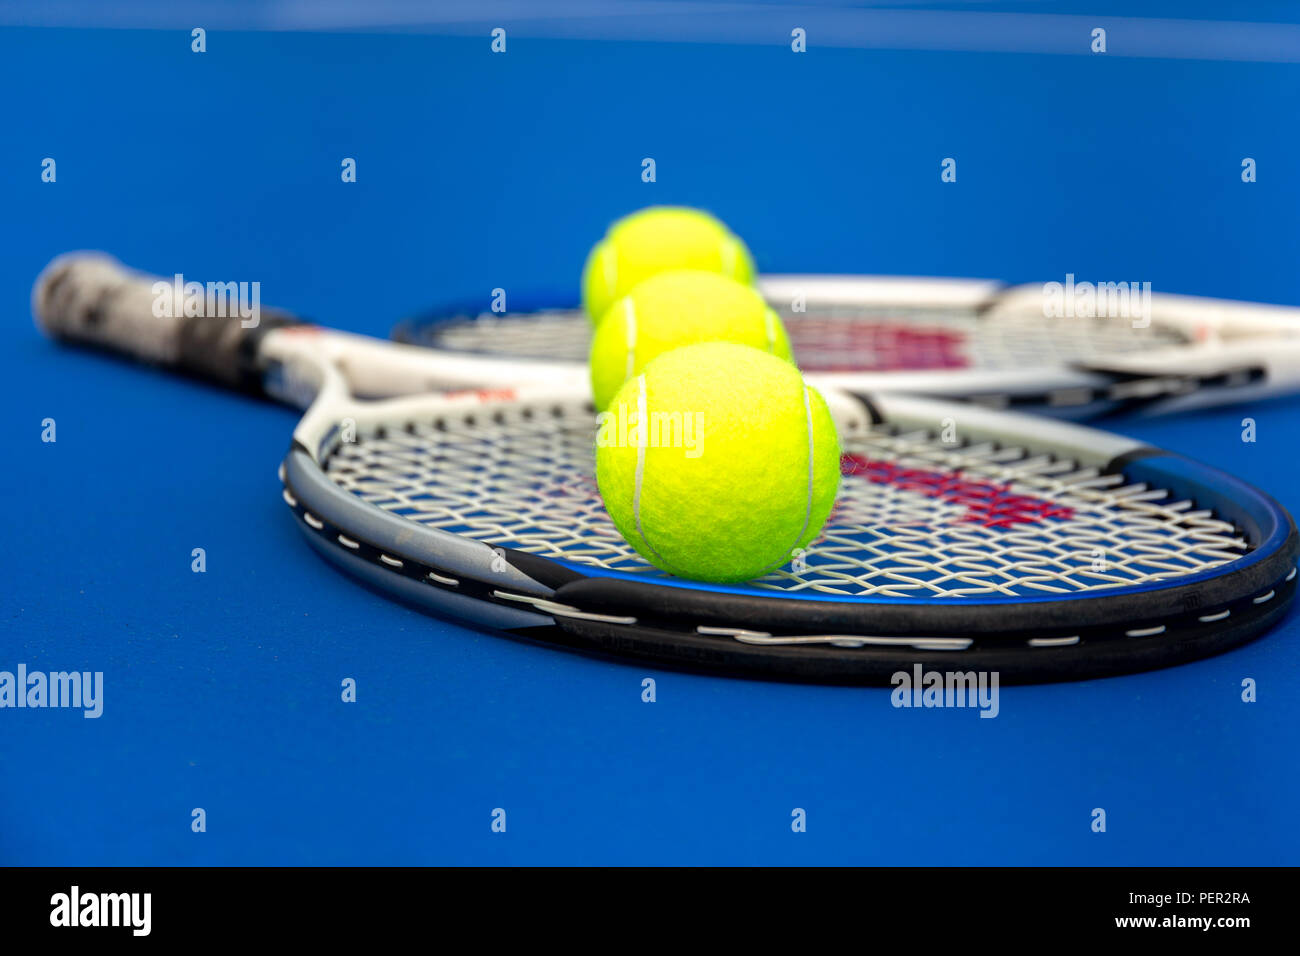 Tennis racket with balls on tennis court outdoor. - Stock Image